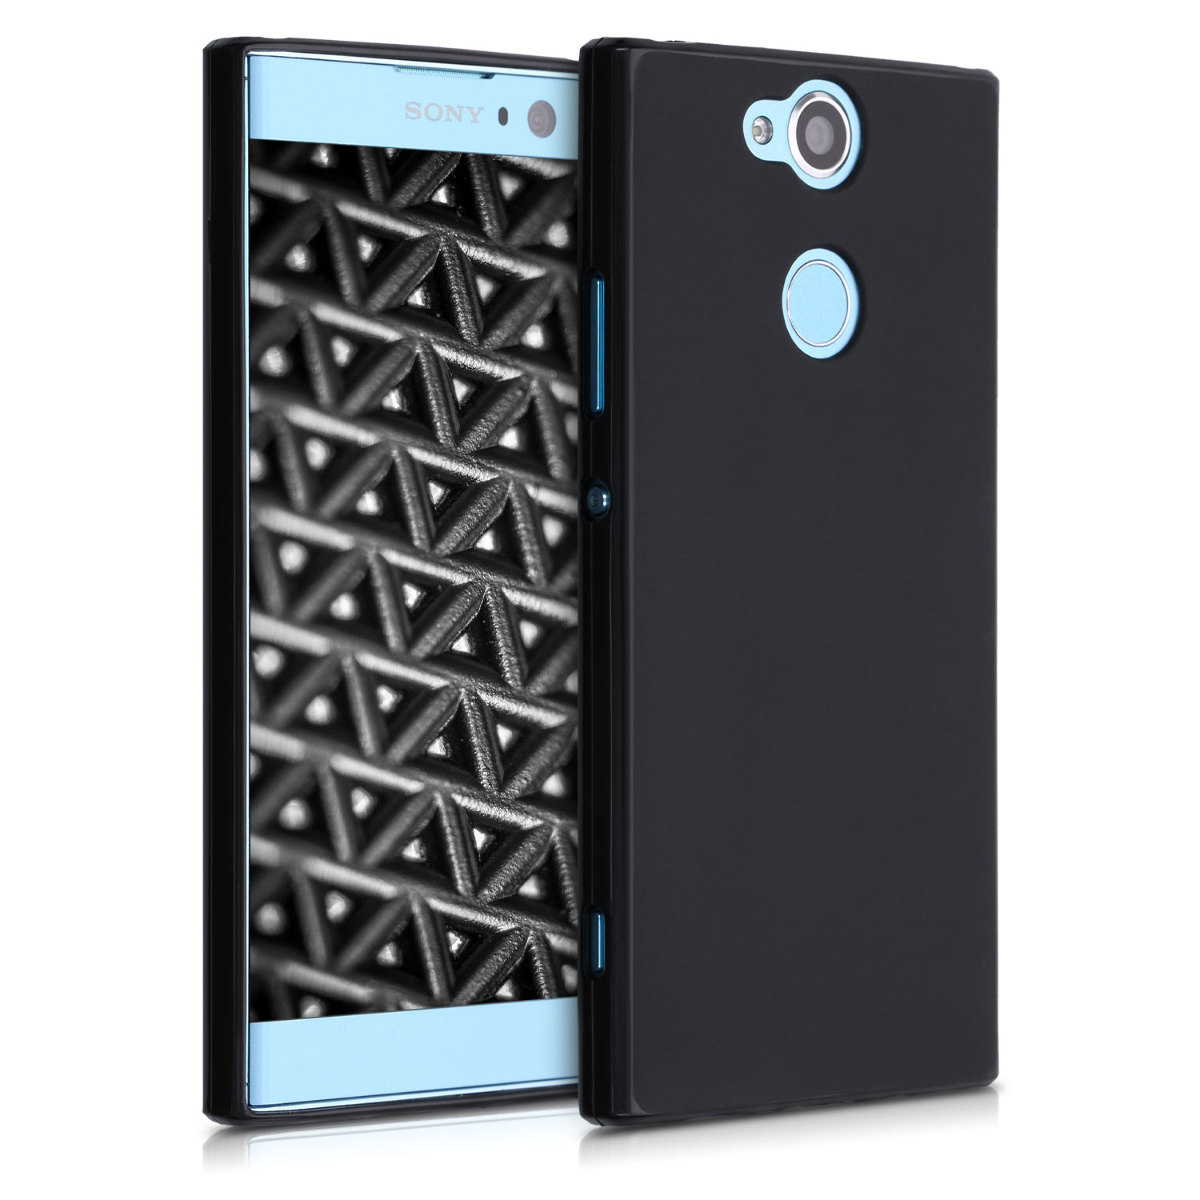 Kvalitní silikonové TPU pouzdro | obal pro Sony Xperia XA2 - černé matné